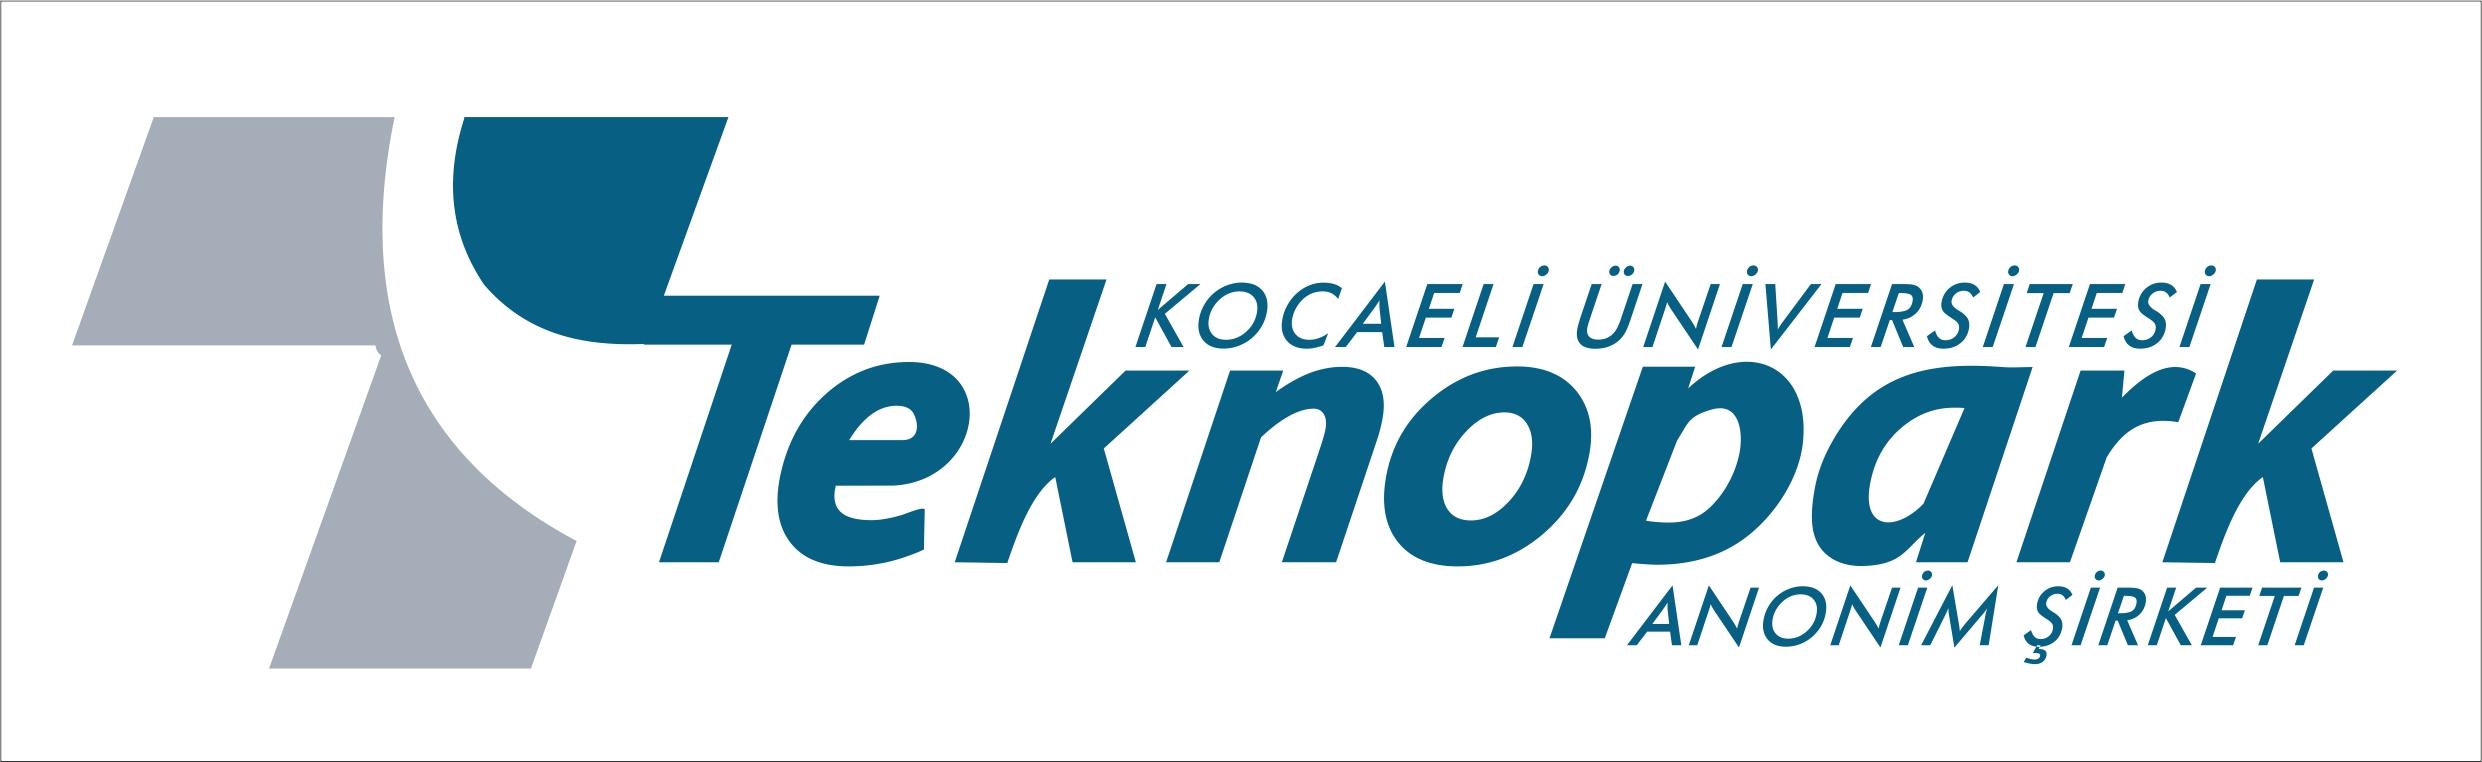 kou-teknopark-logo